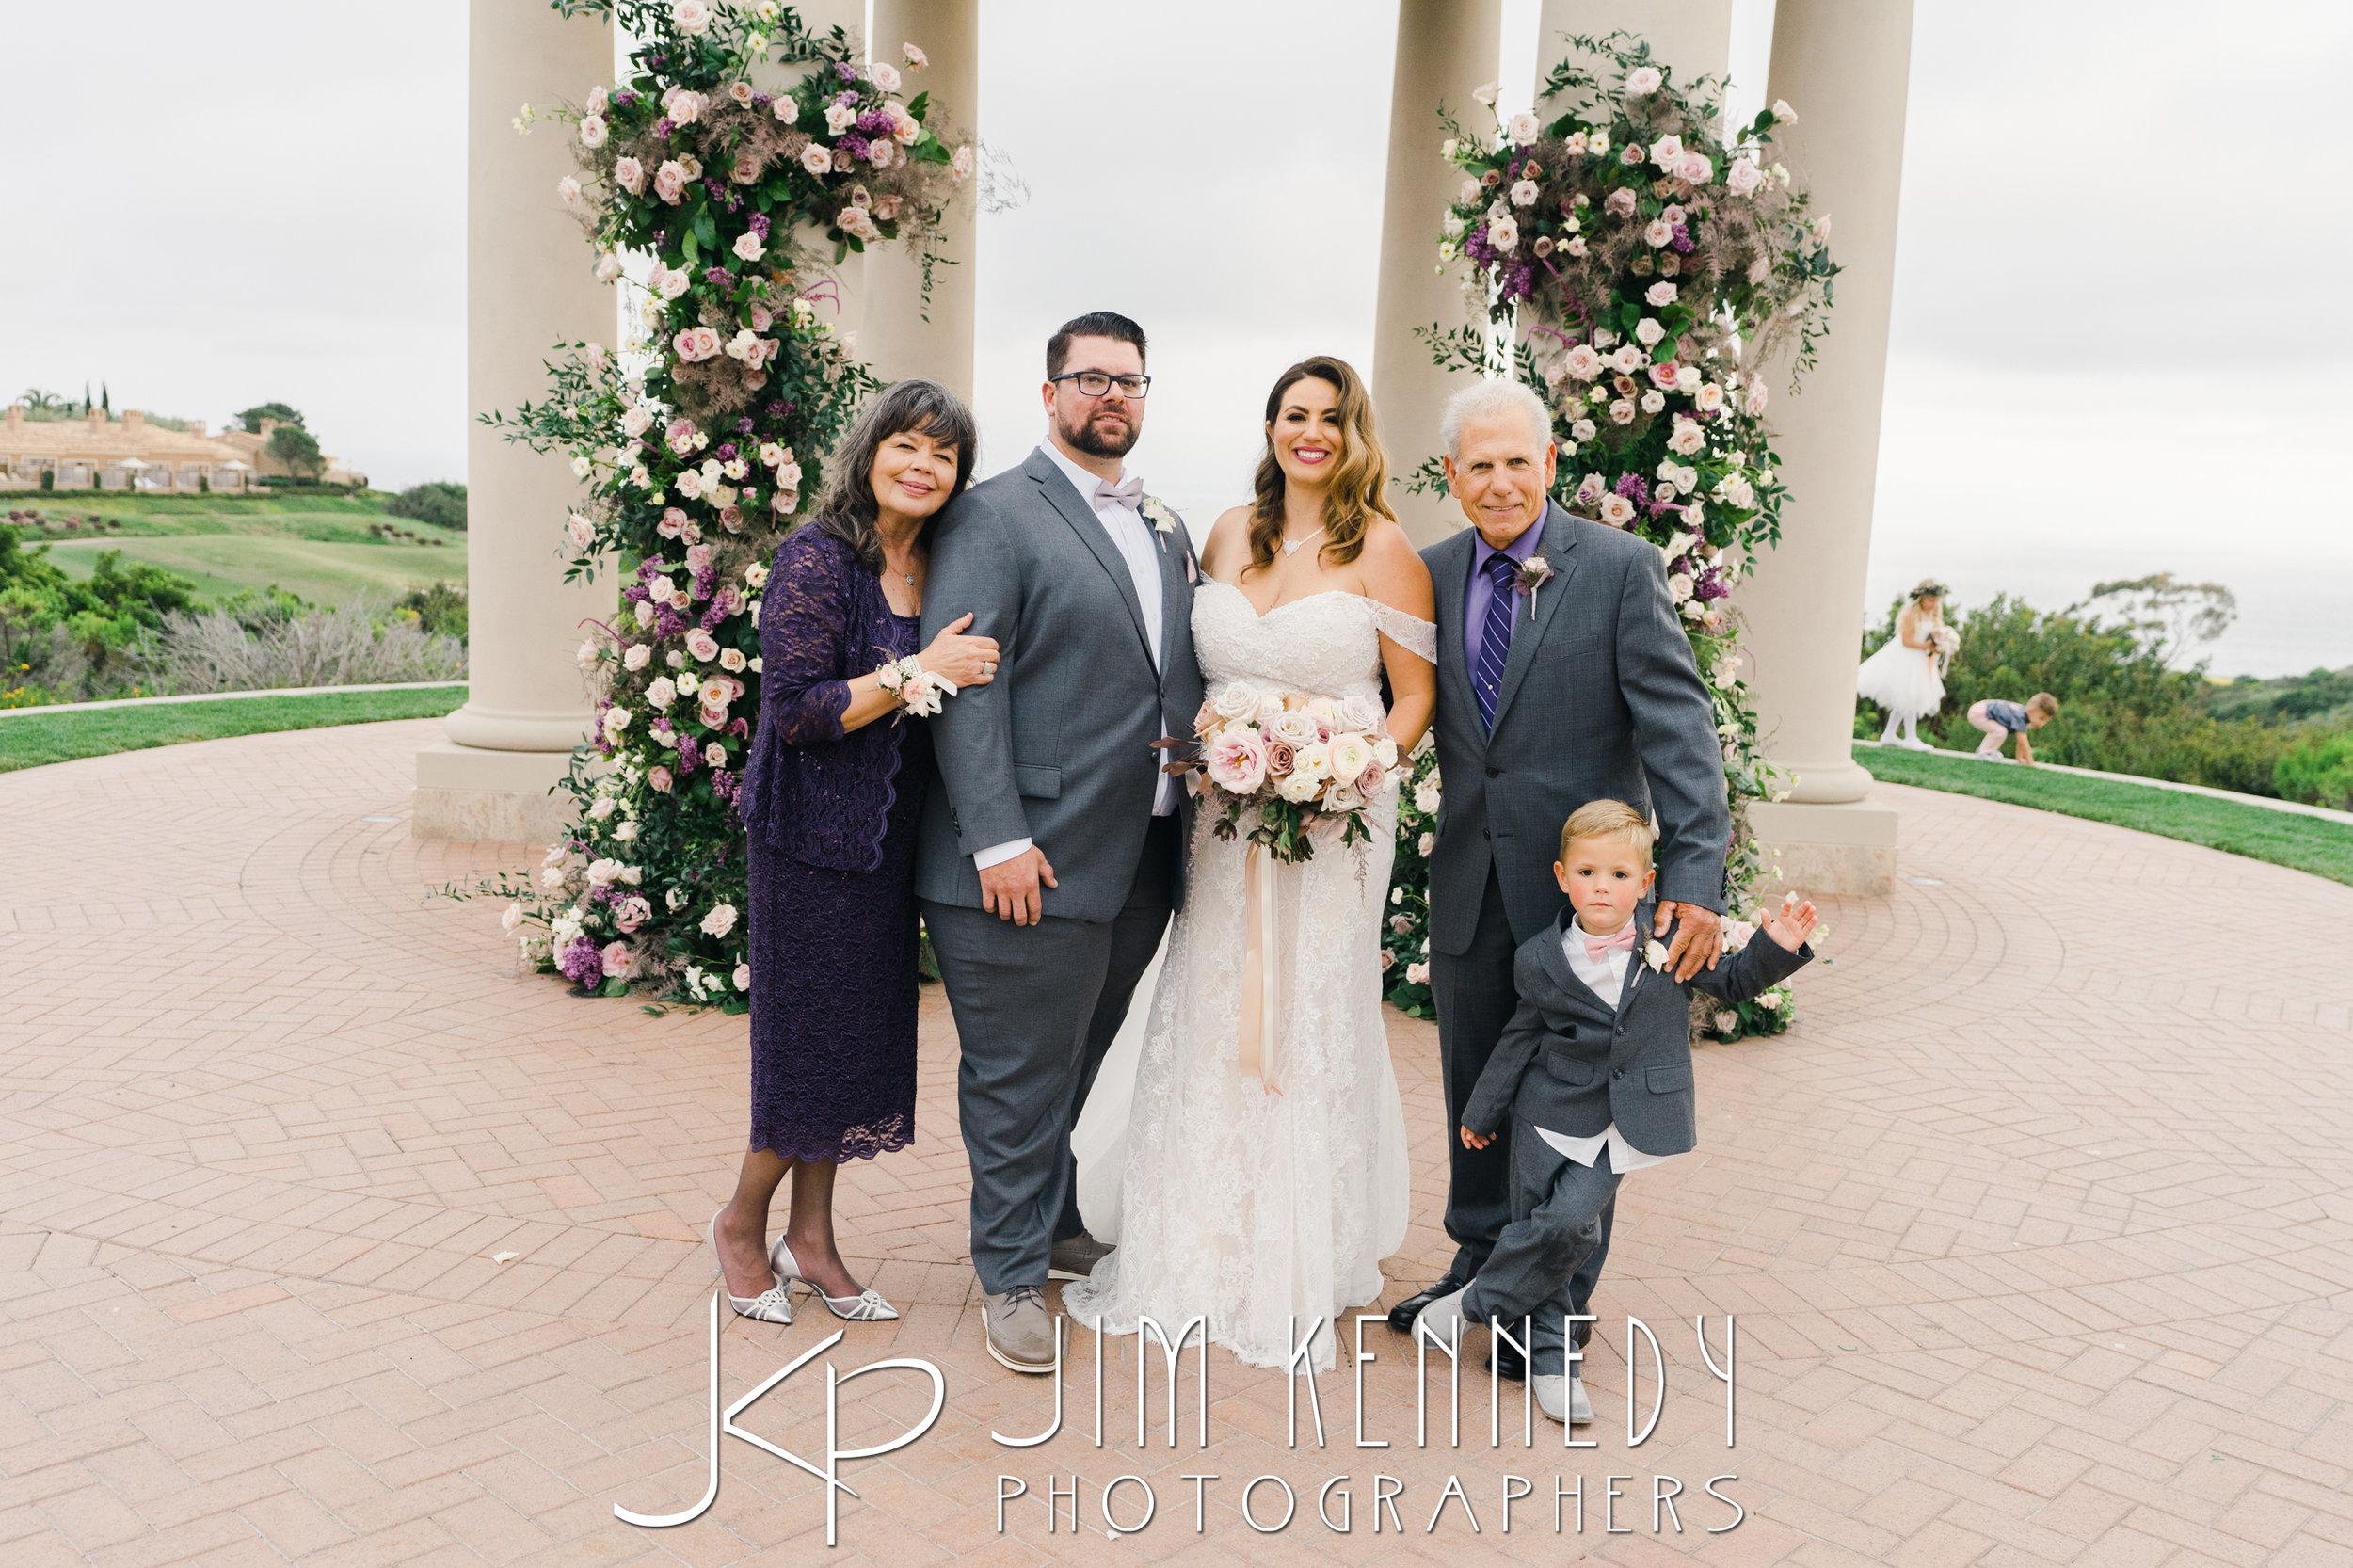 pelican-hill-wedding-jim-kenedy-photographers_0143.JPG